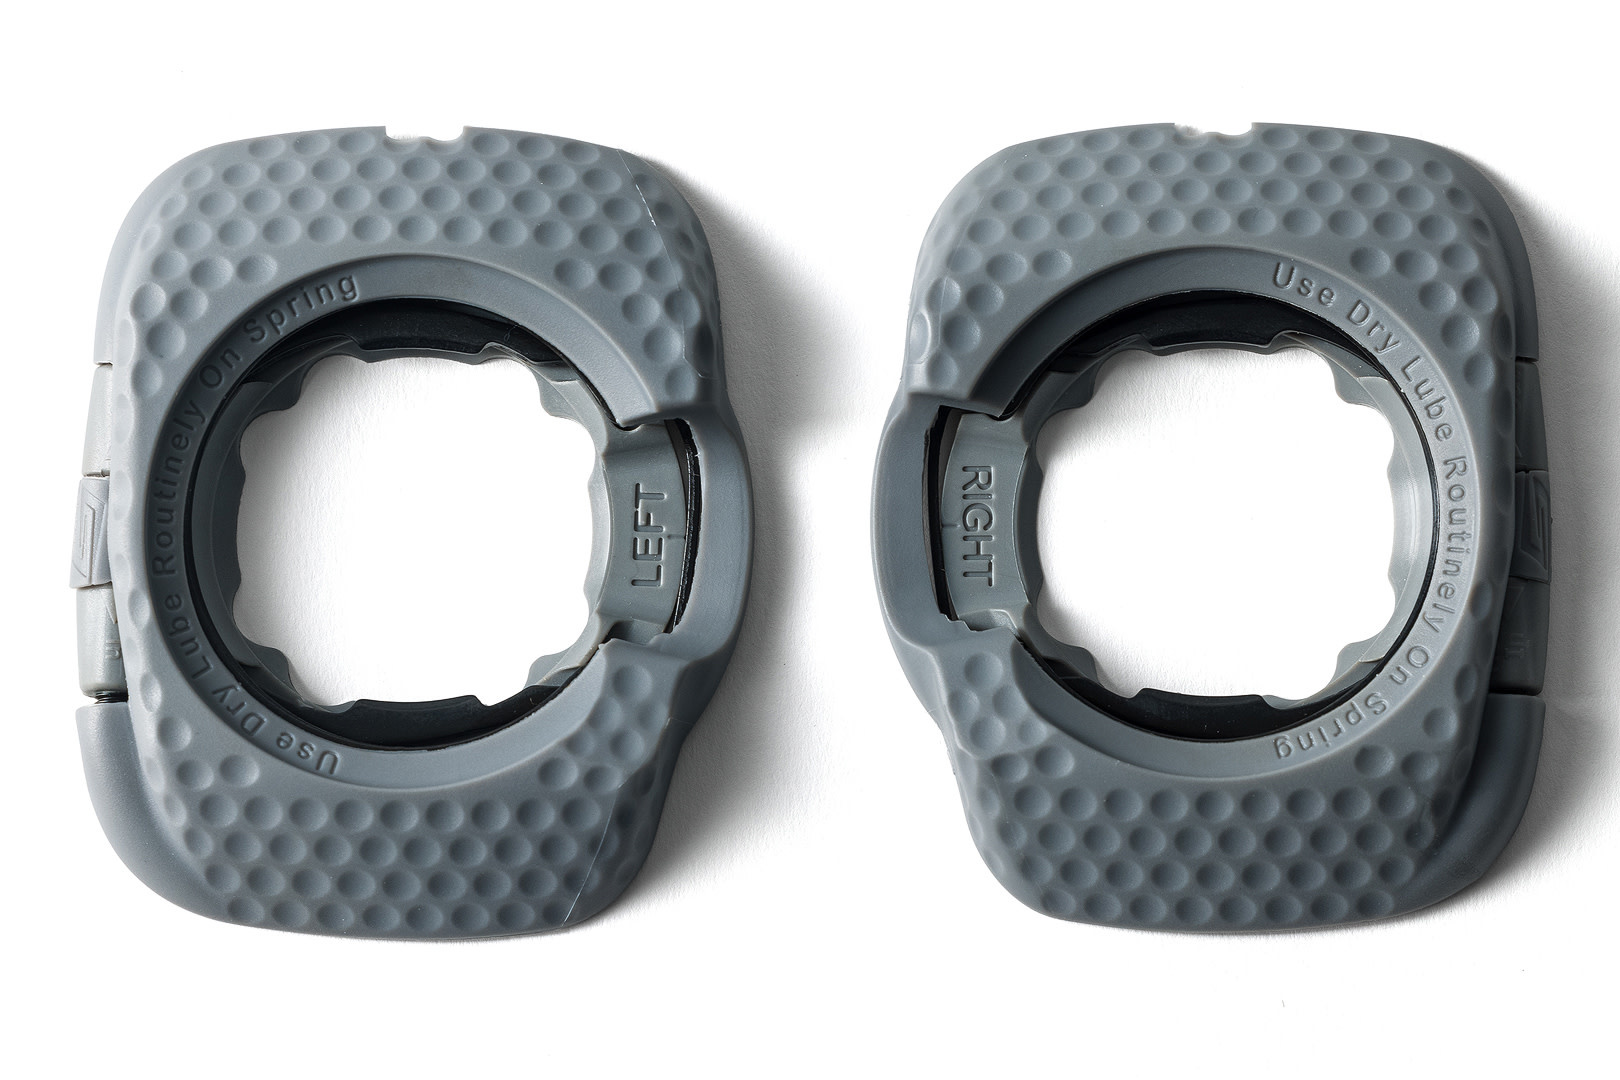 Wahoo Fitness Speedplay (Wahoo) COMP Pedal